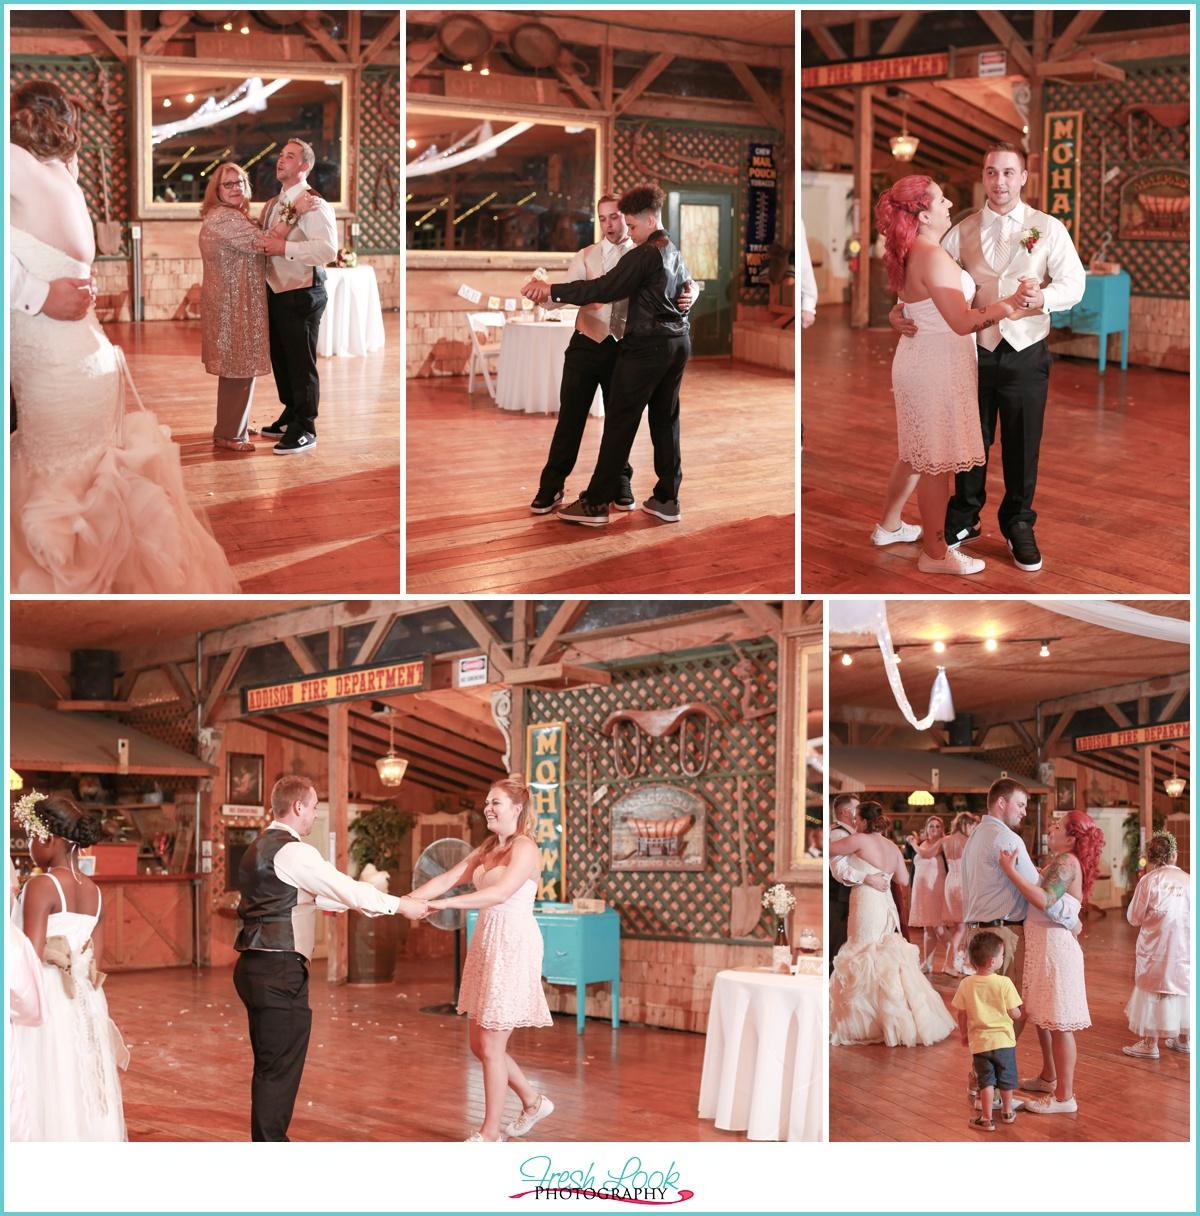 dance floor party time